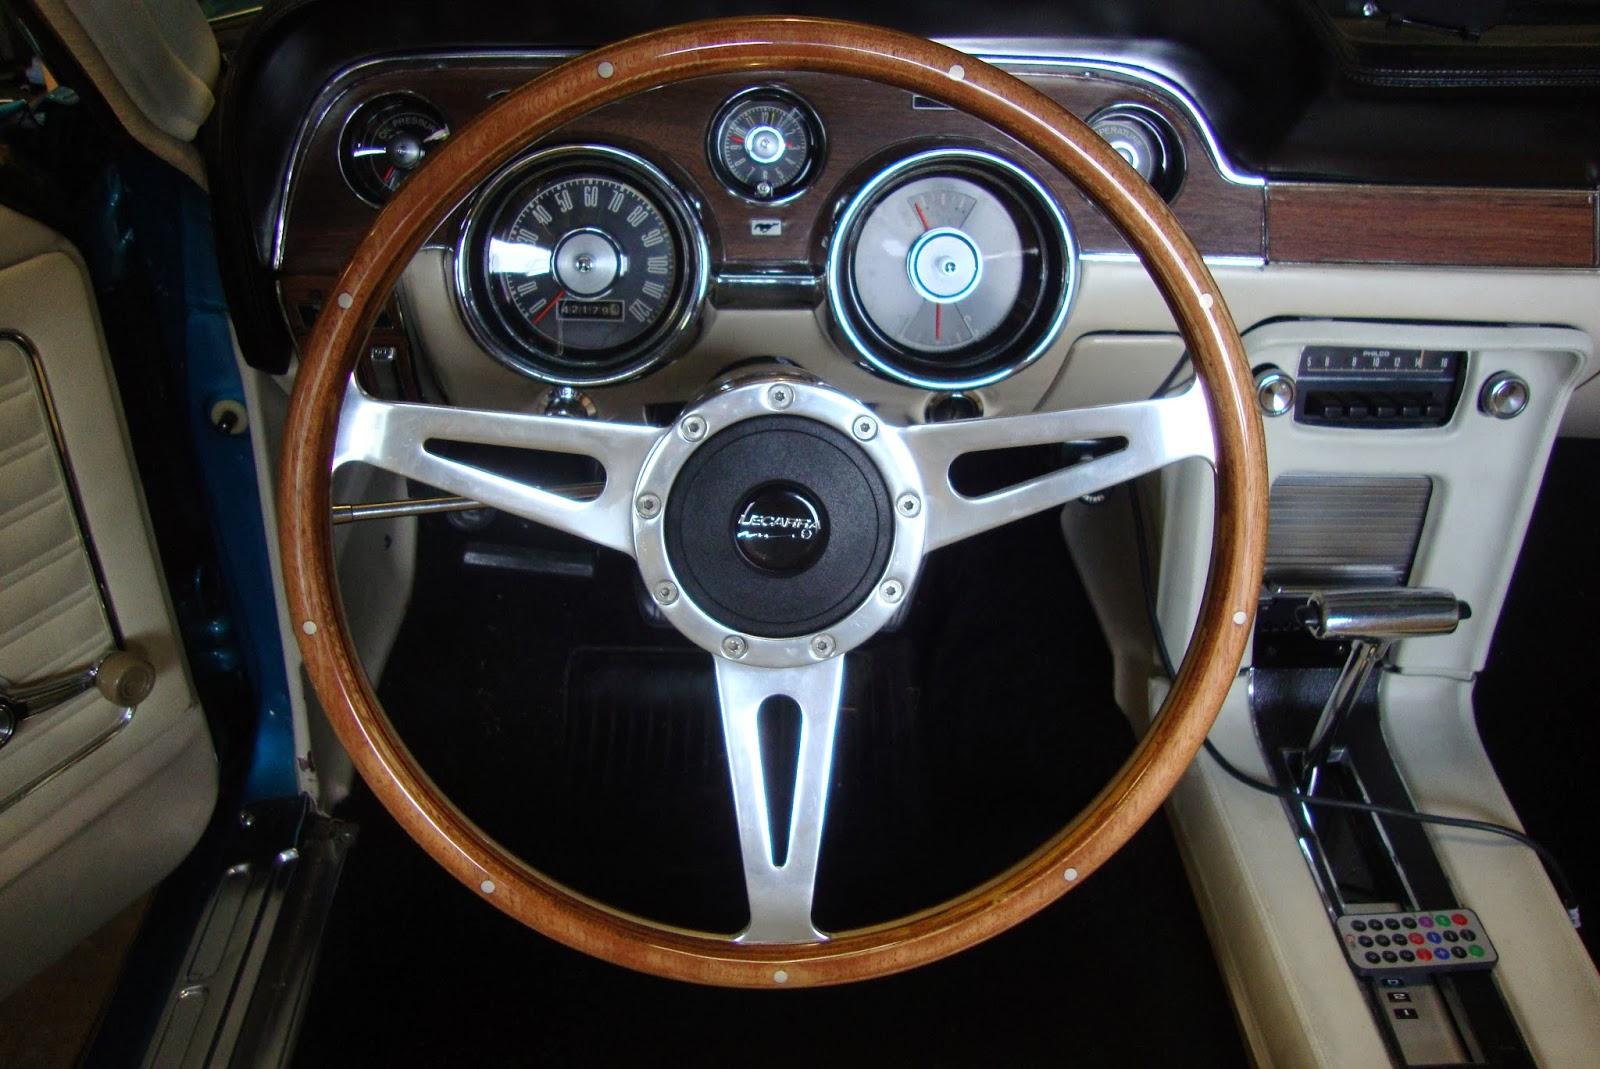 1968 mustang convertible restoration a new steering wheel from santa. Black Bedroom Furniture Sets. Home Design Ideas